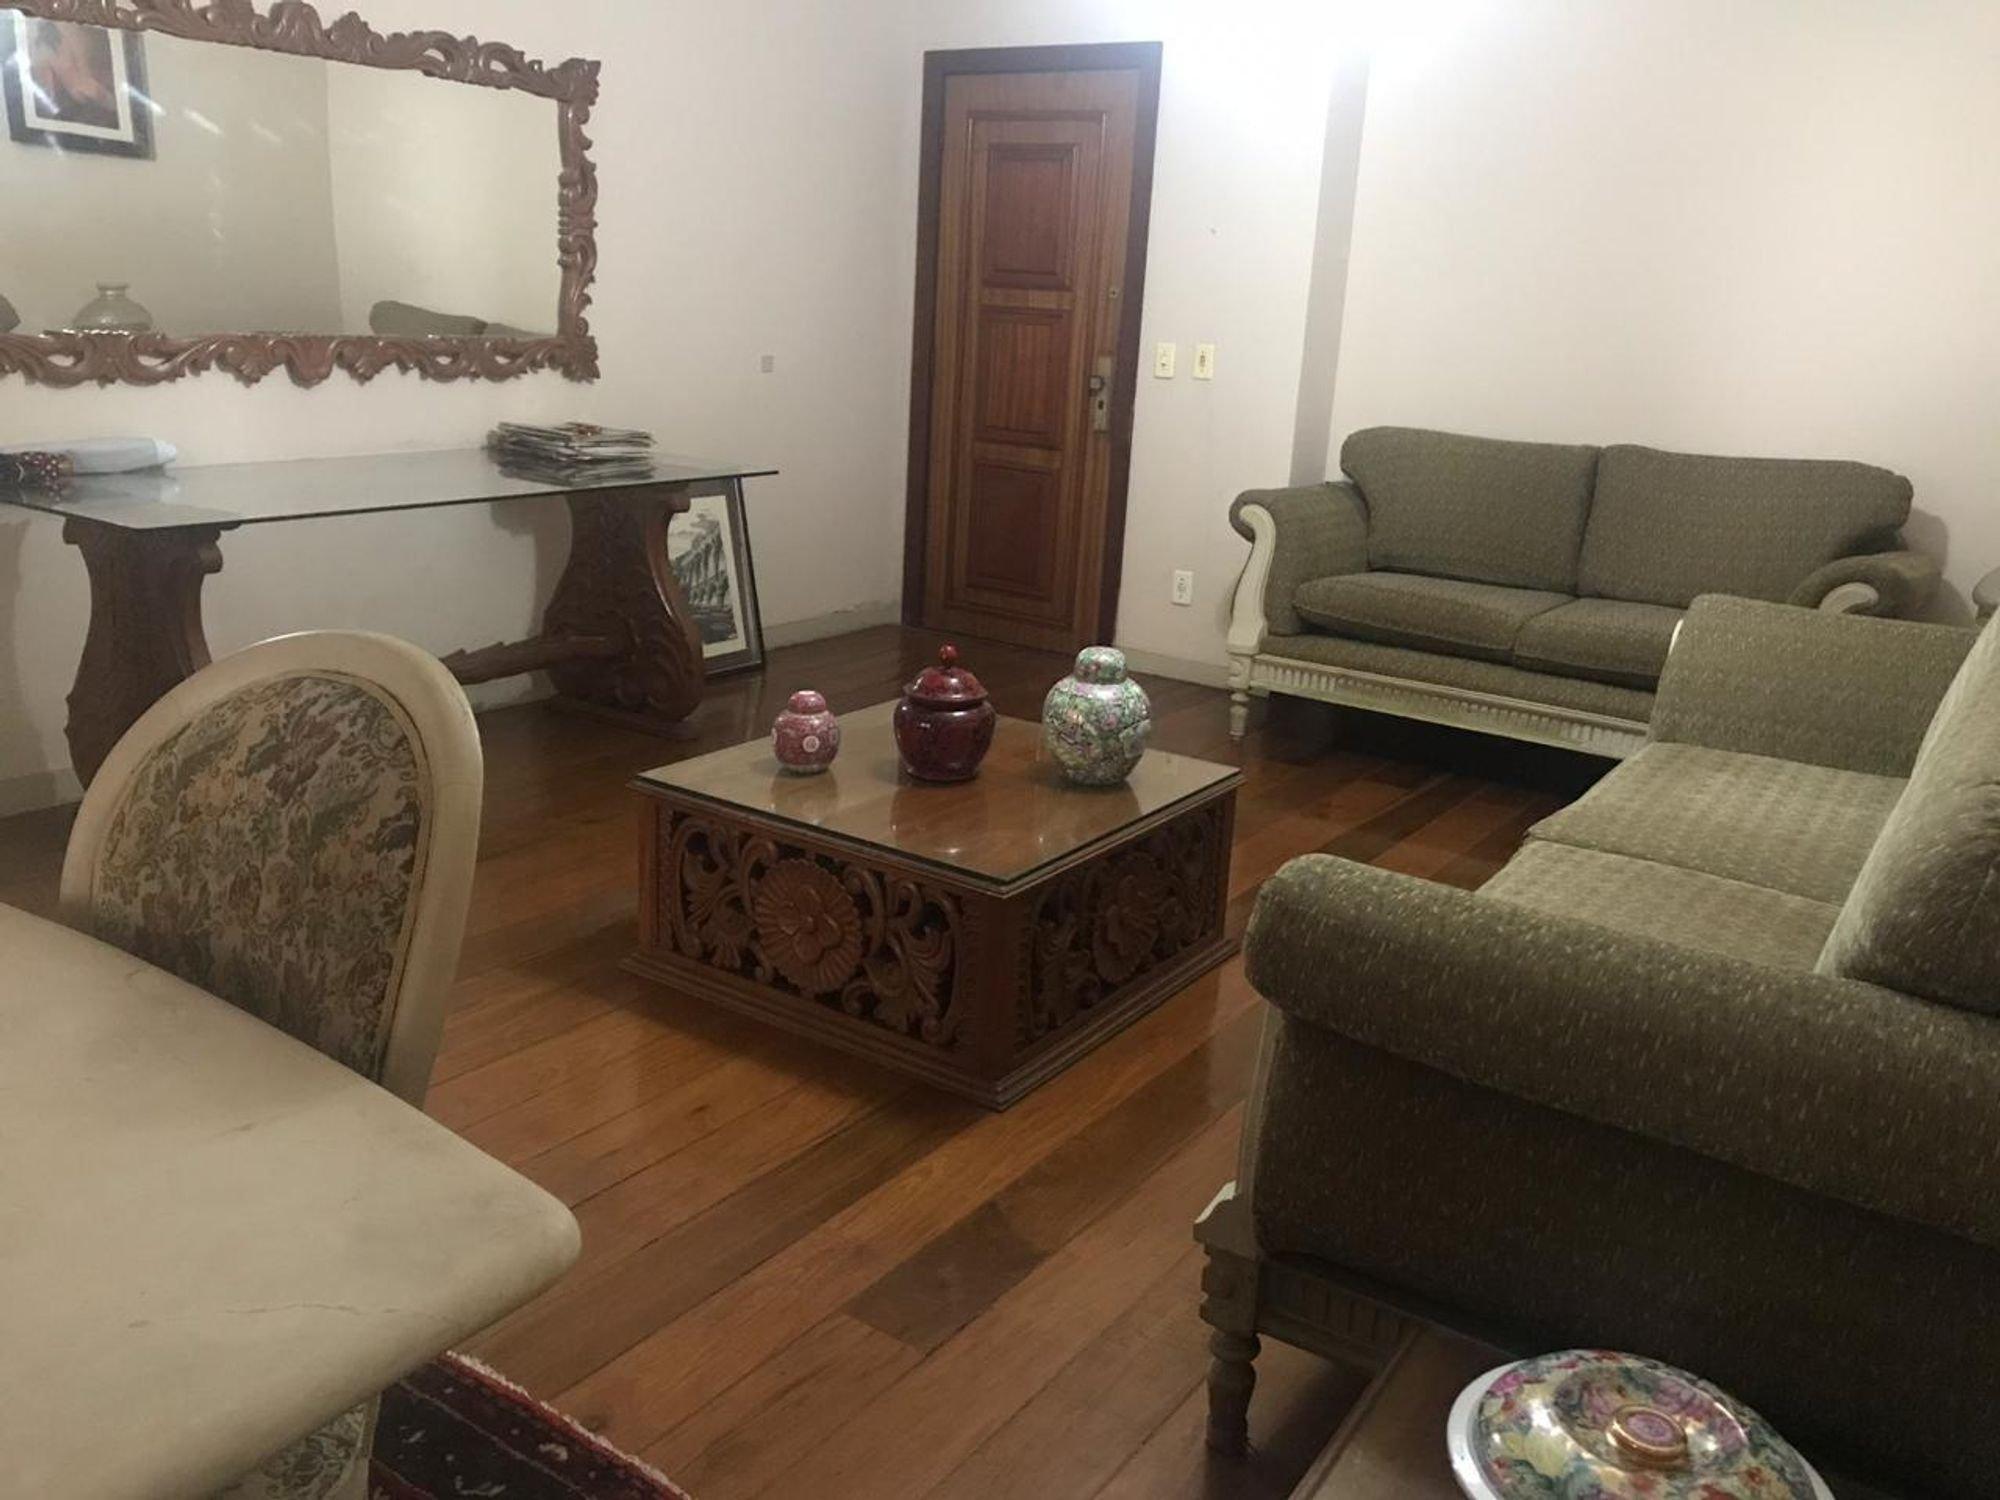 Foto de Sala com sofá, vaso, garrafa, cadeira, mesa de jantar